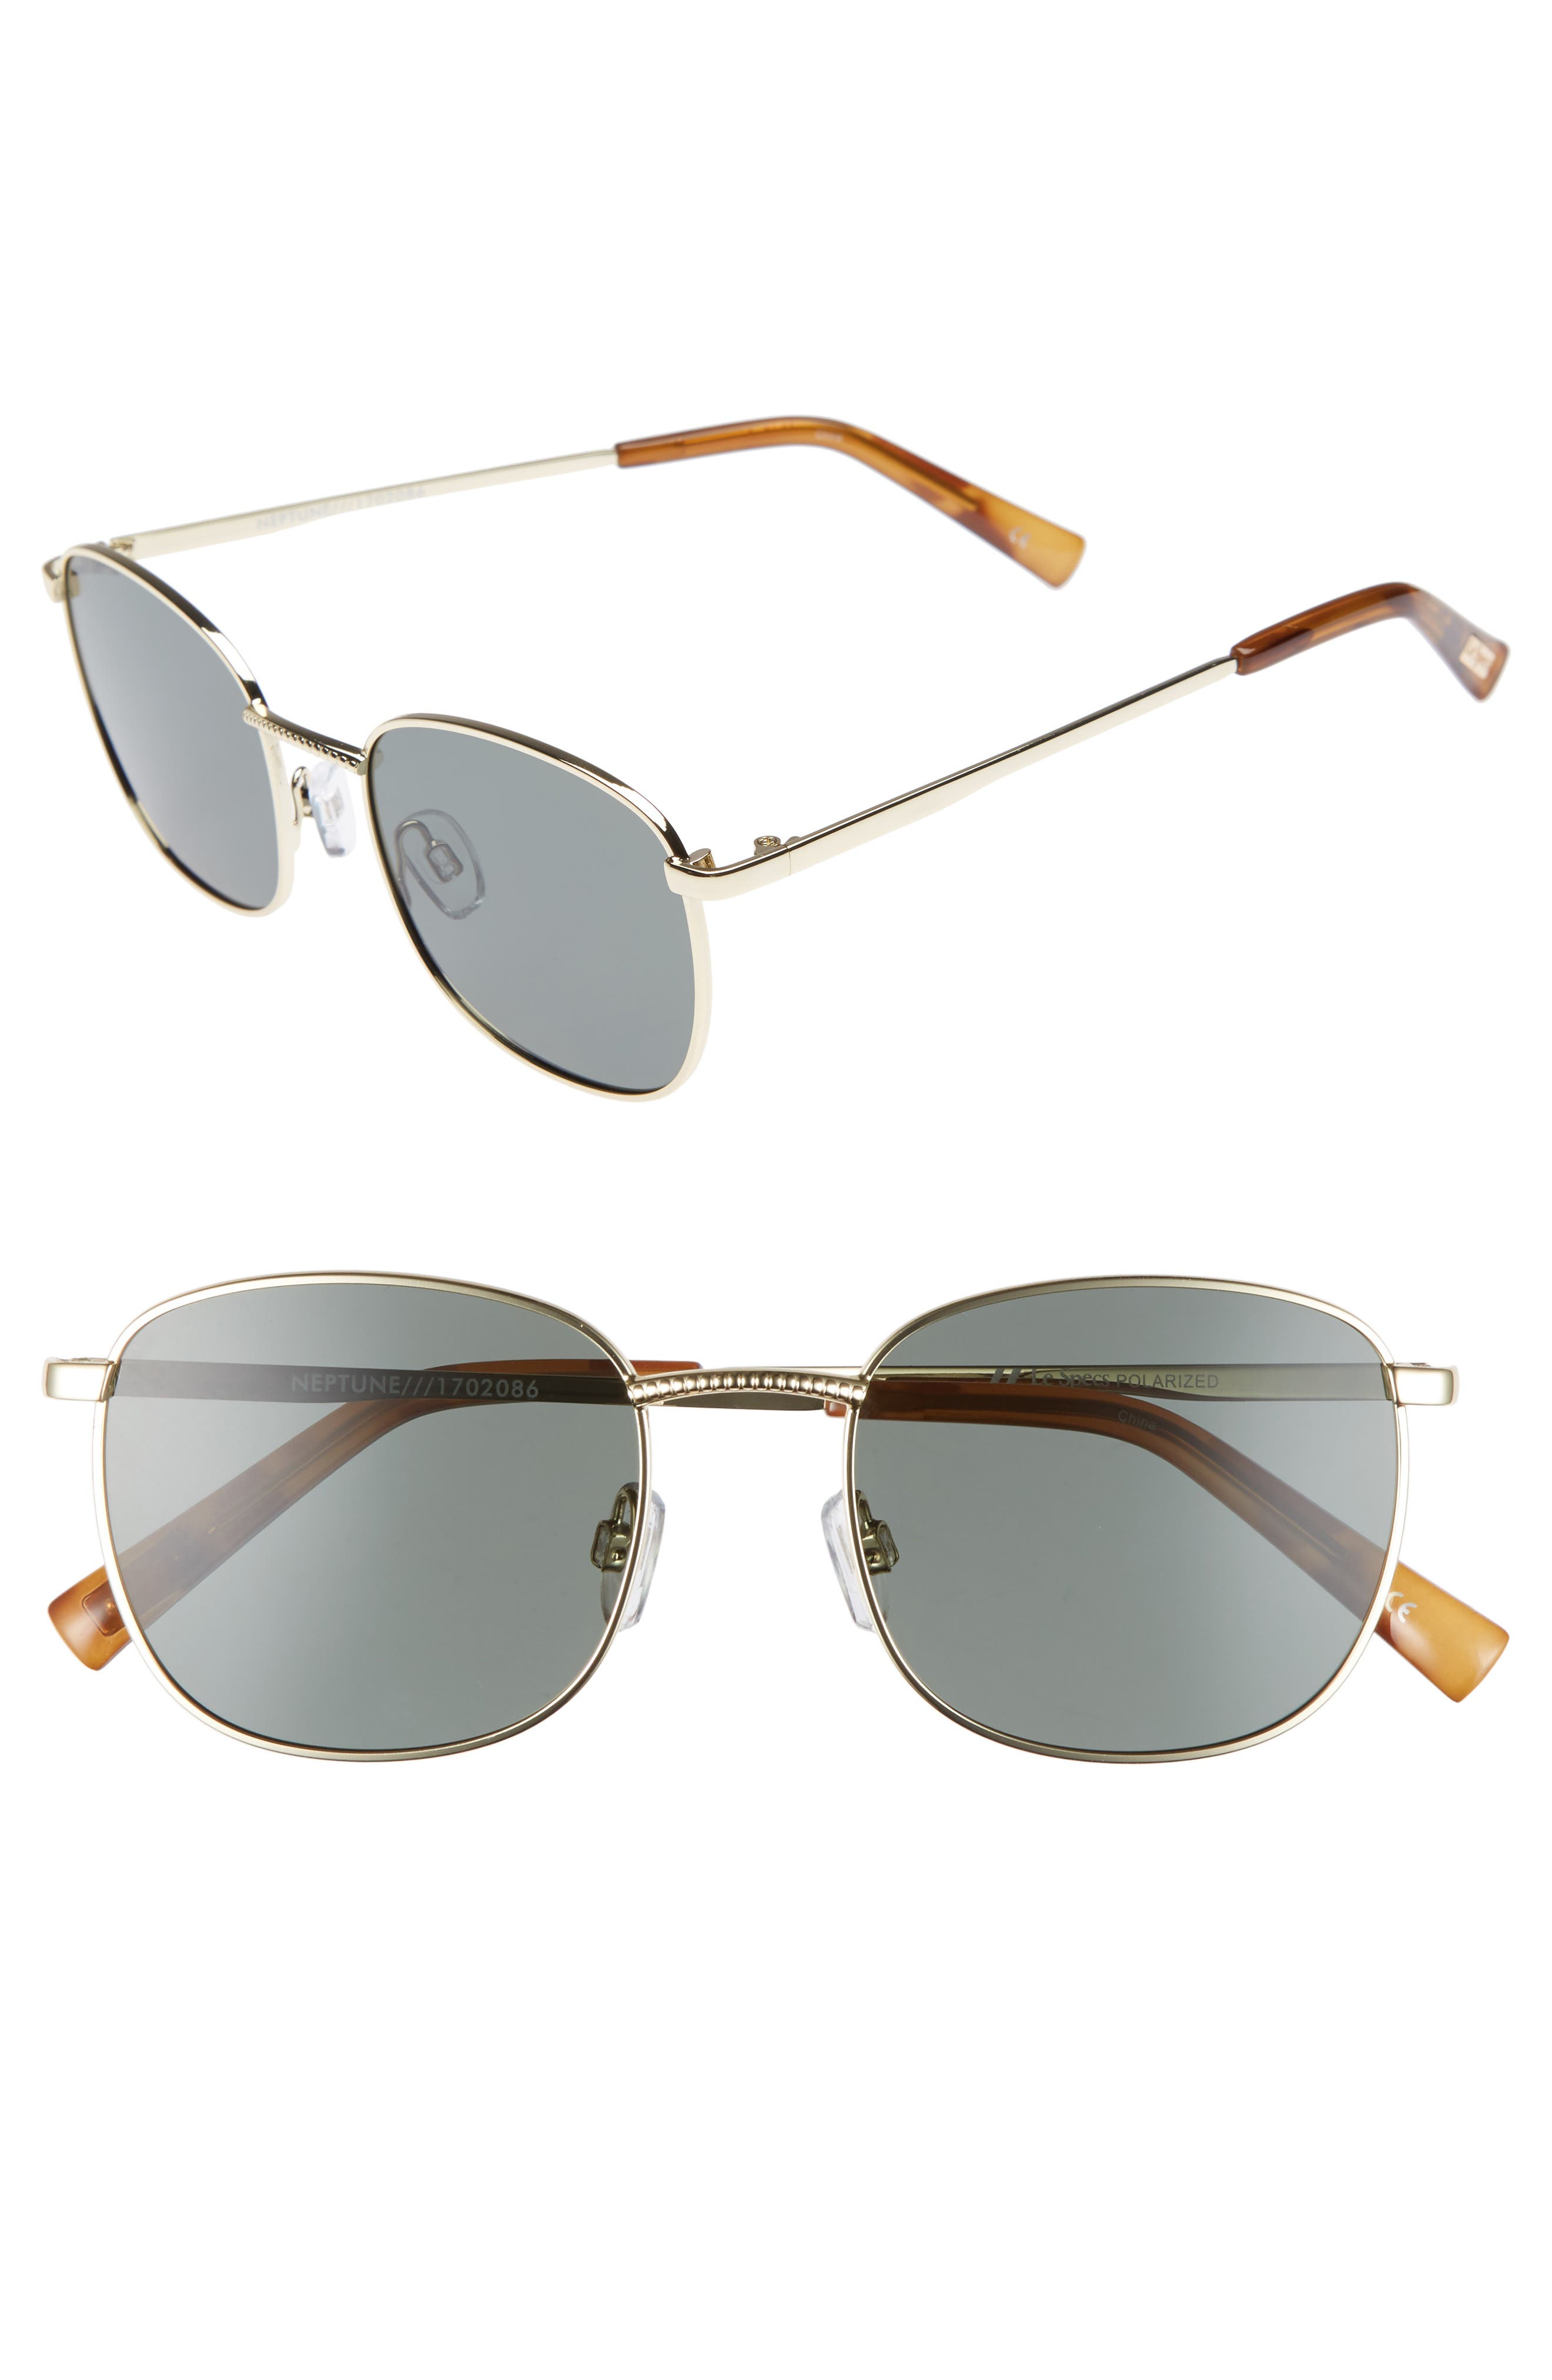 Neptune 49mm Sunglasses,                             Main thumbnail 1, color,                             Bright Gold